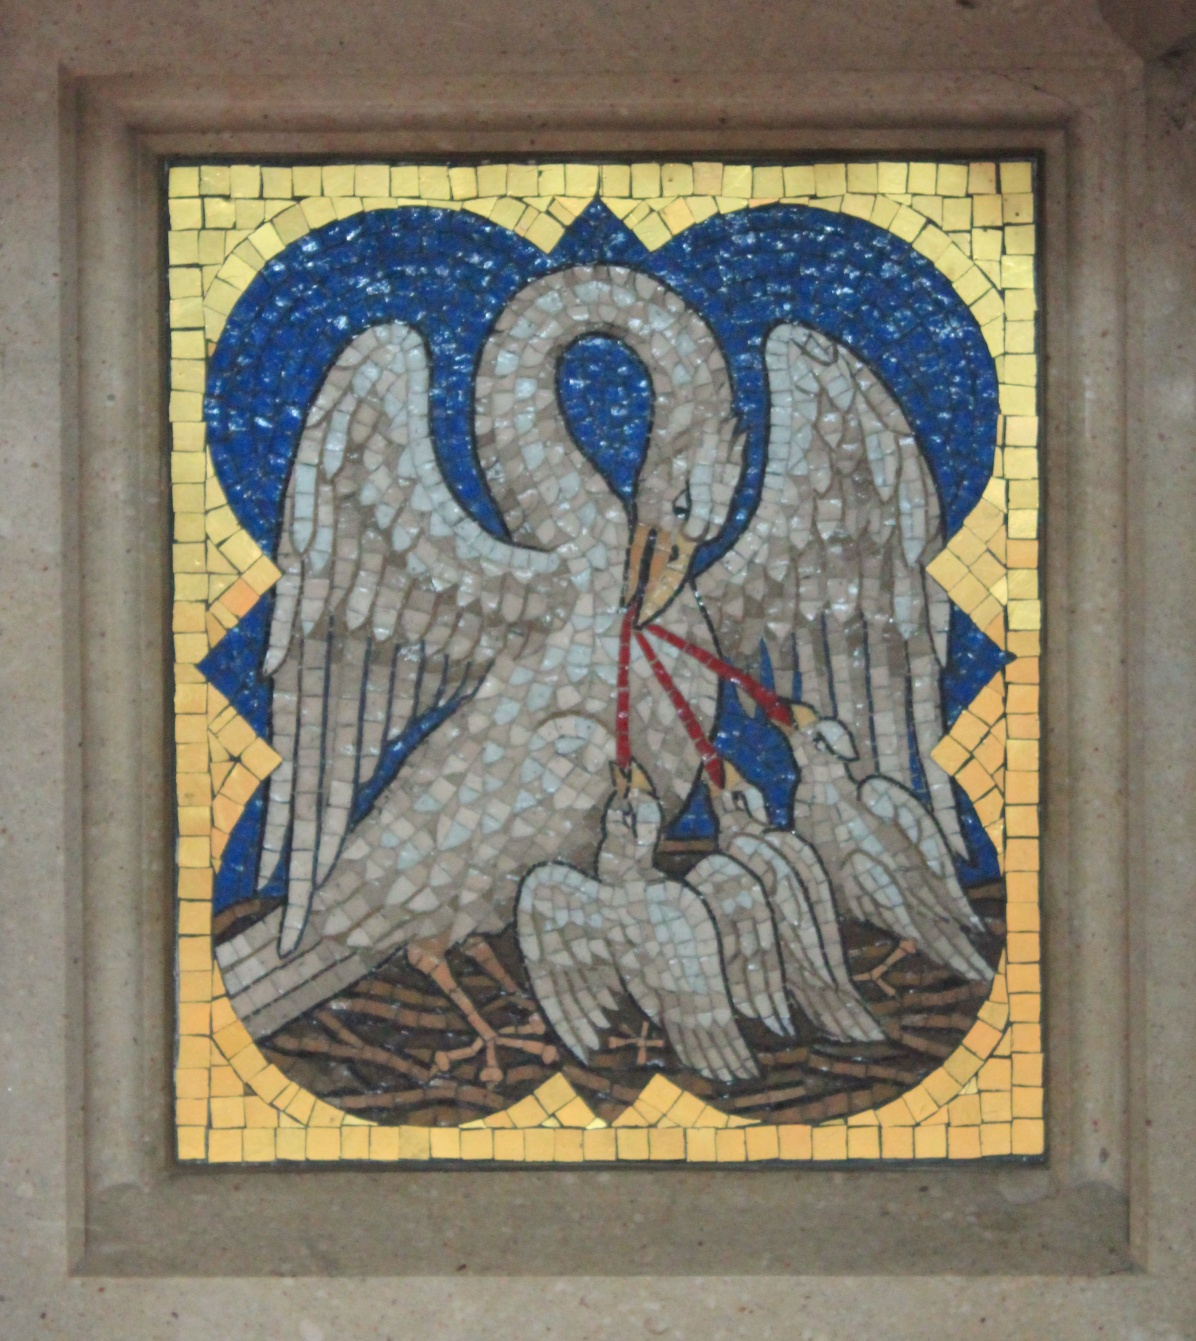 Pelican's Breast Image